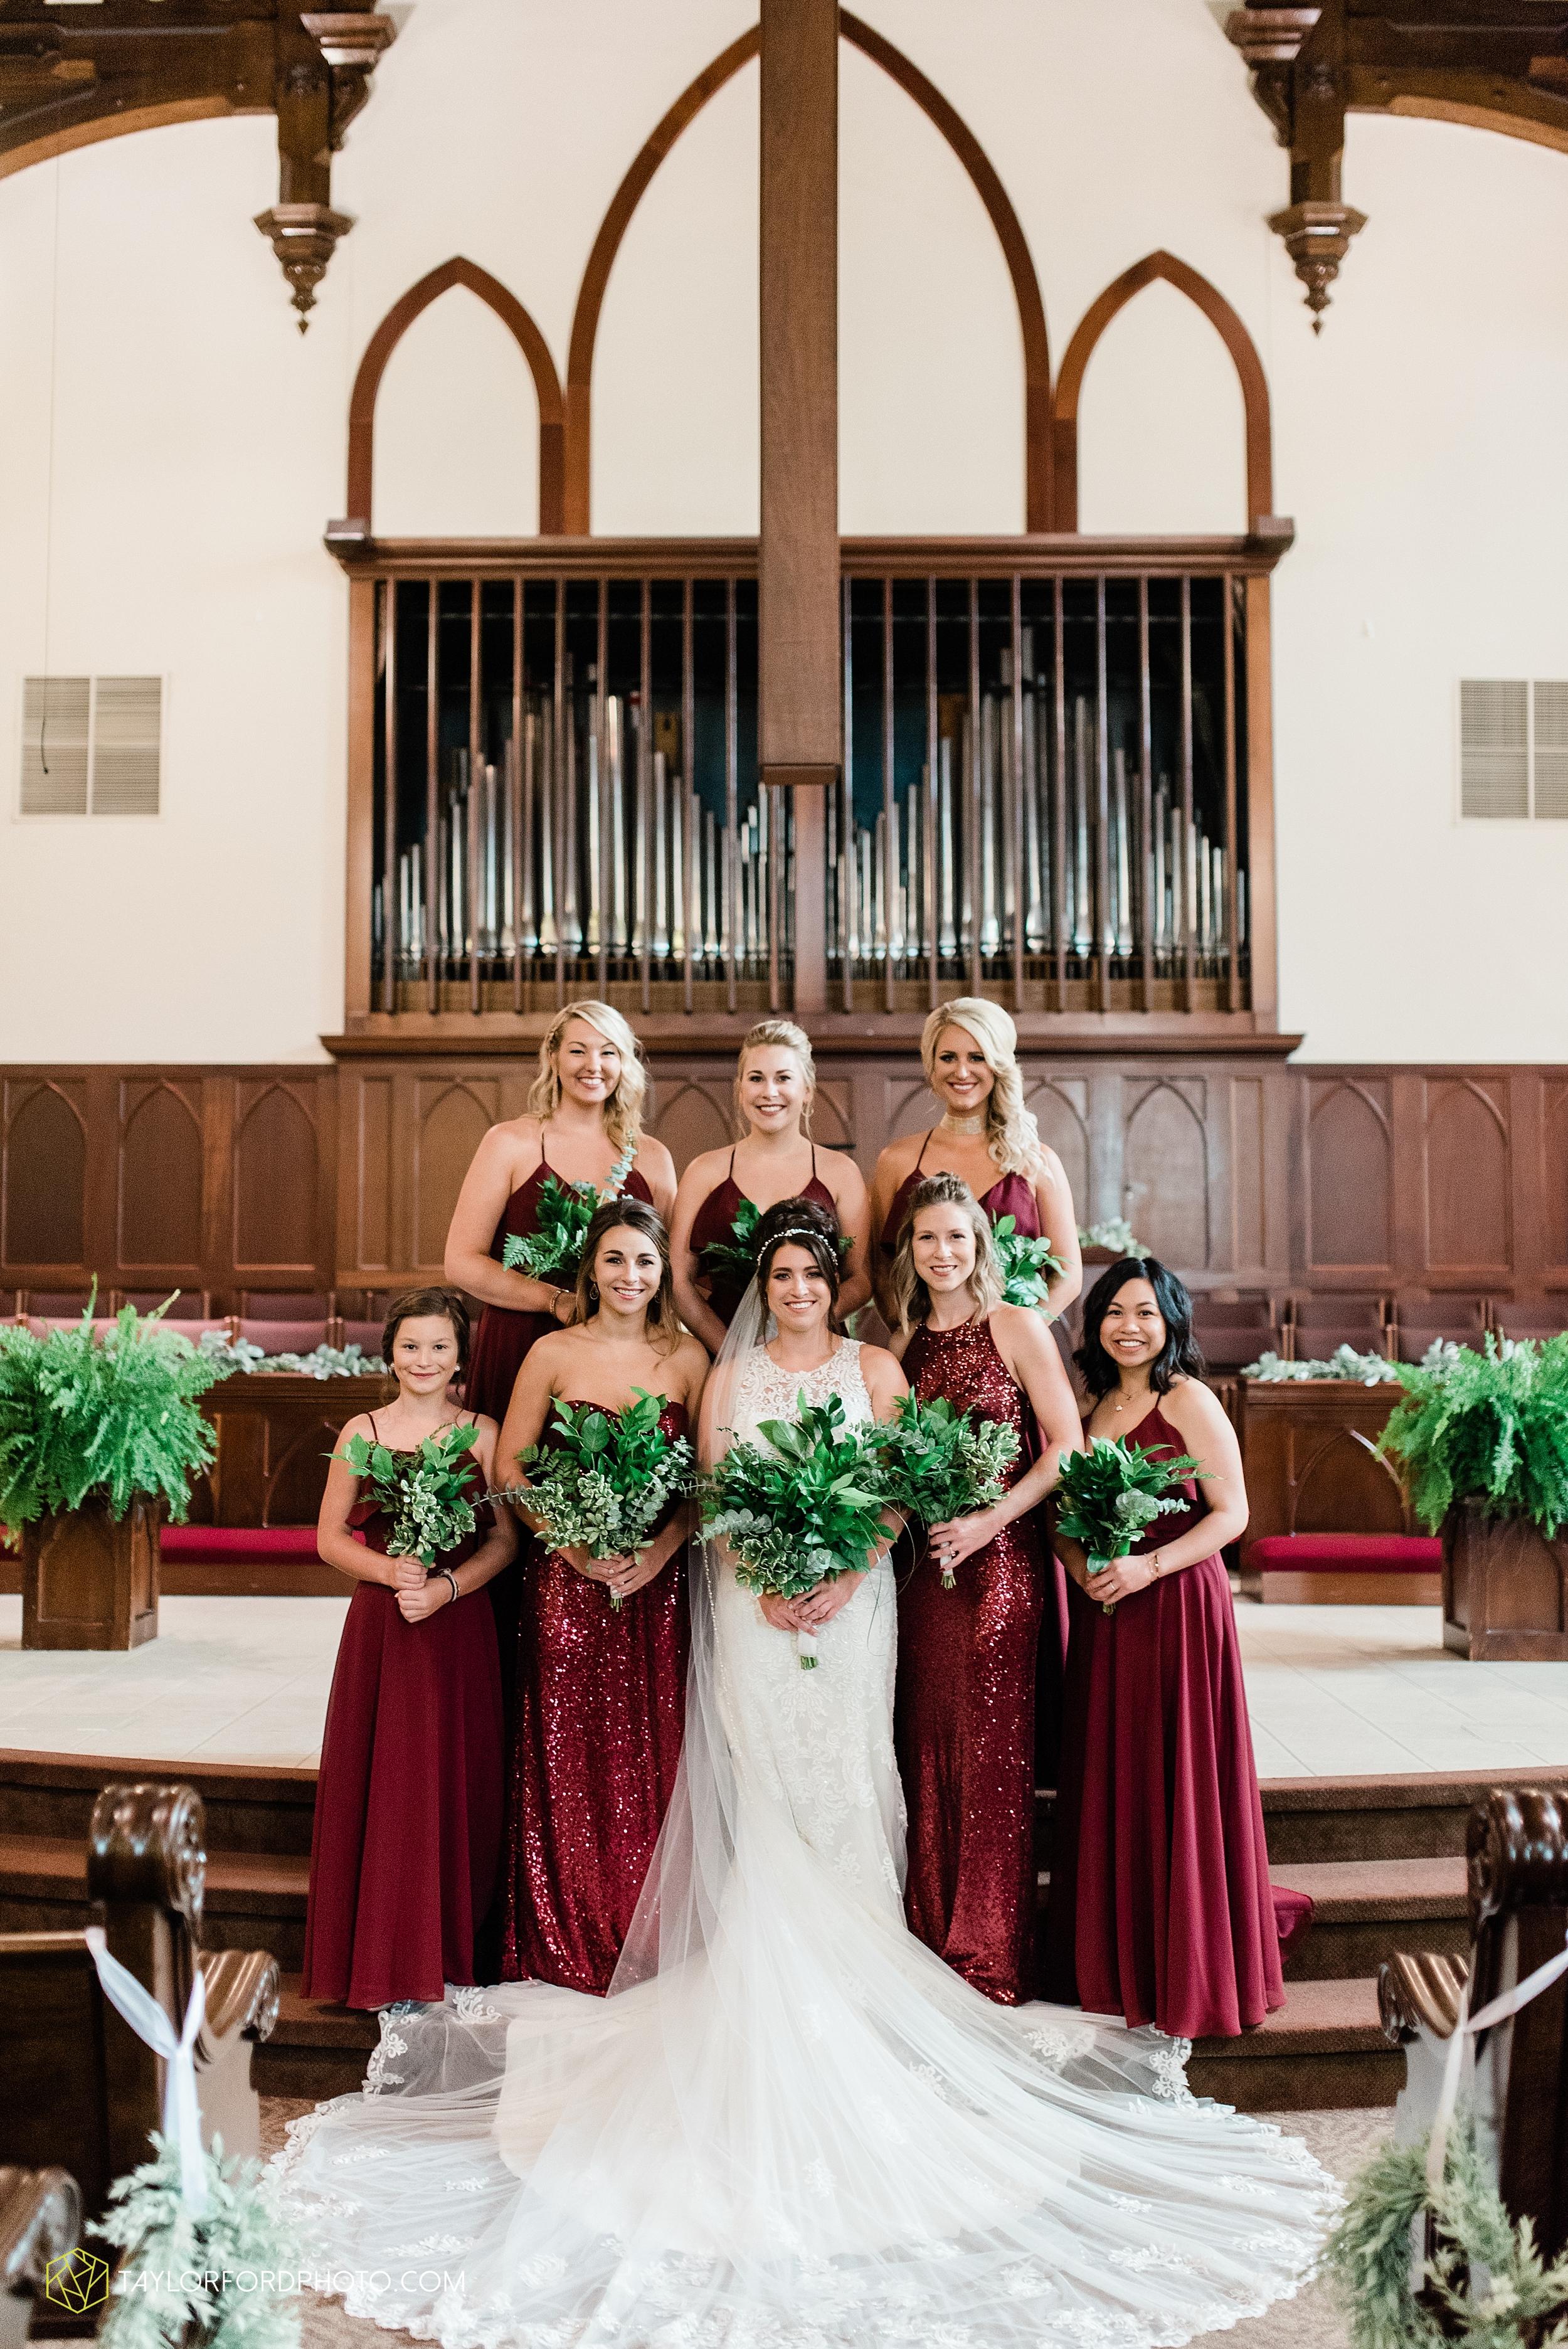 van-wert-ohio-first-united-methodist-church-county-dairy-barn-wedding-photographer-taylor-ford-photography_9813.jpg